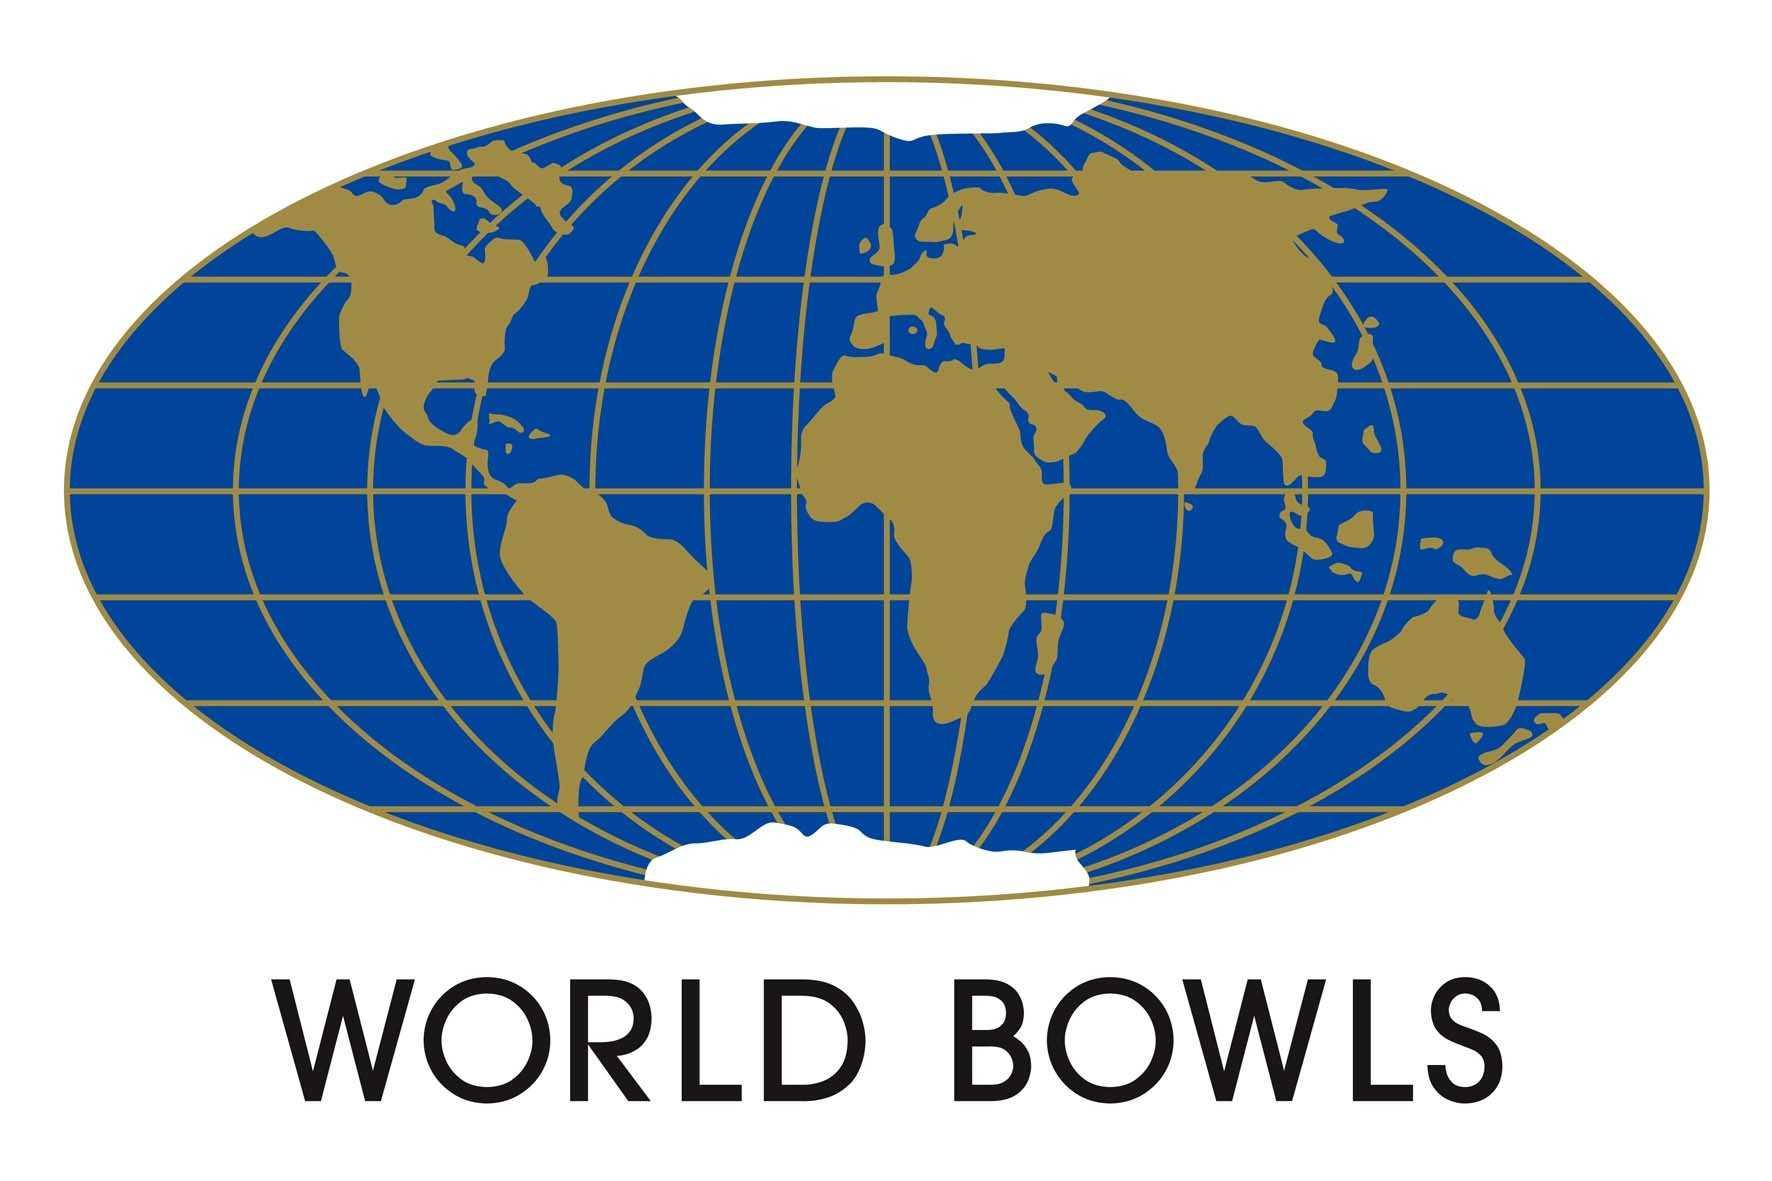 bowls world